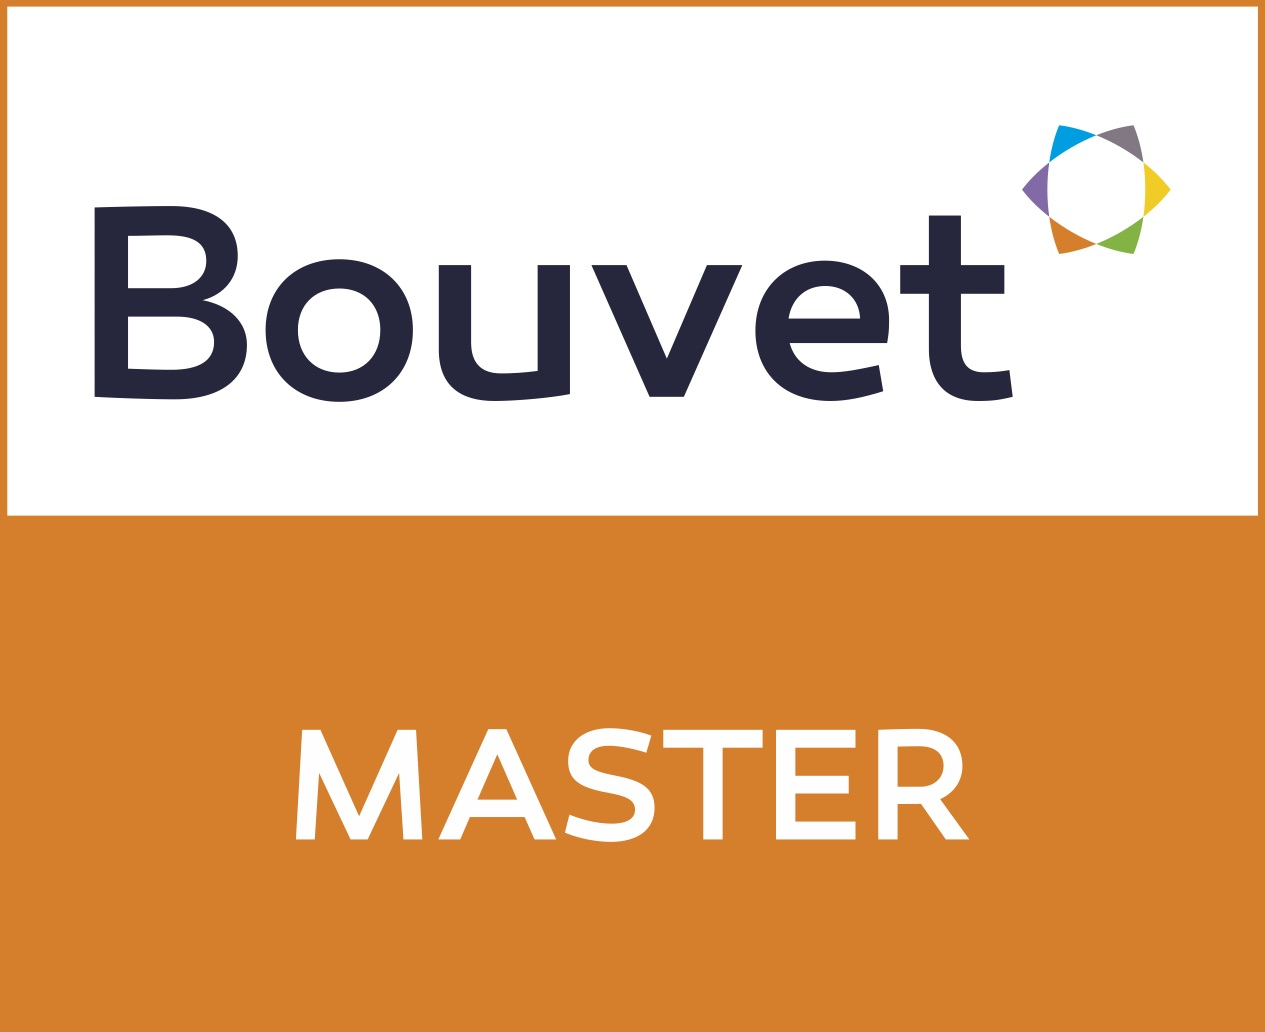 bouvet master